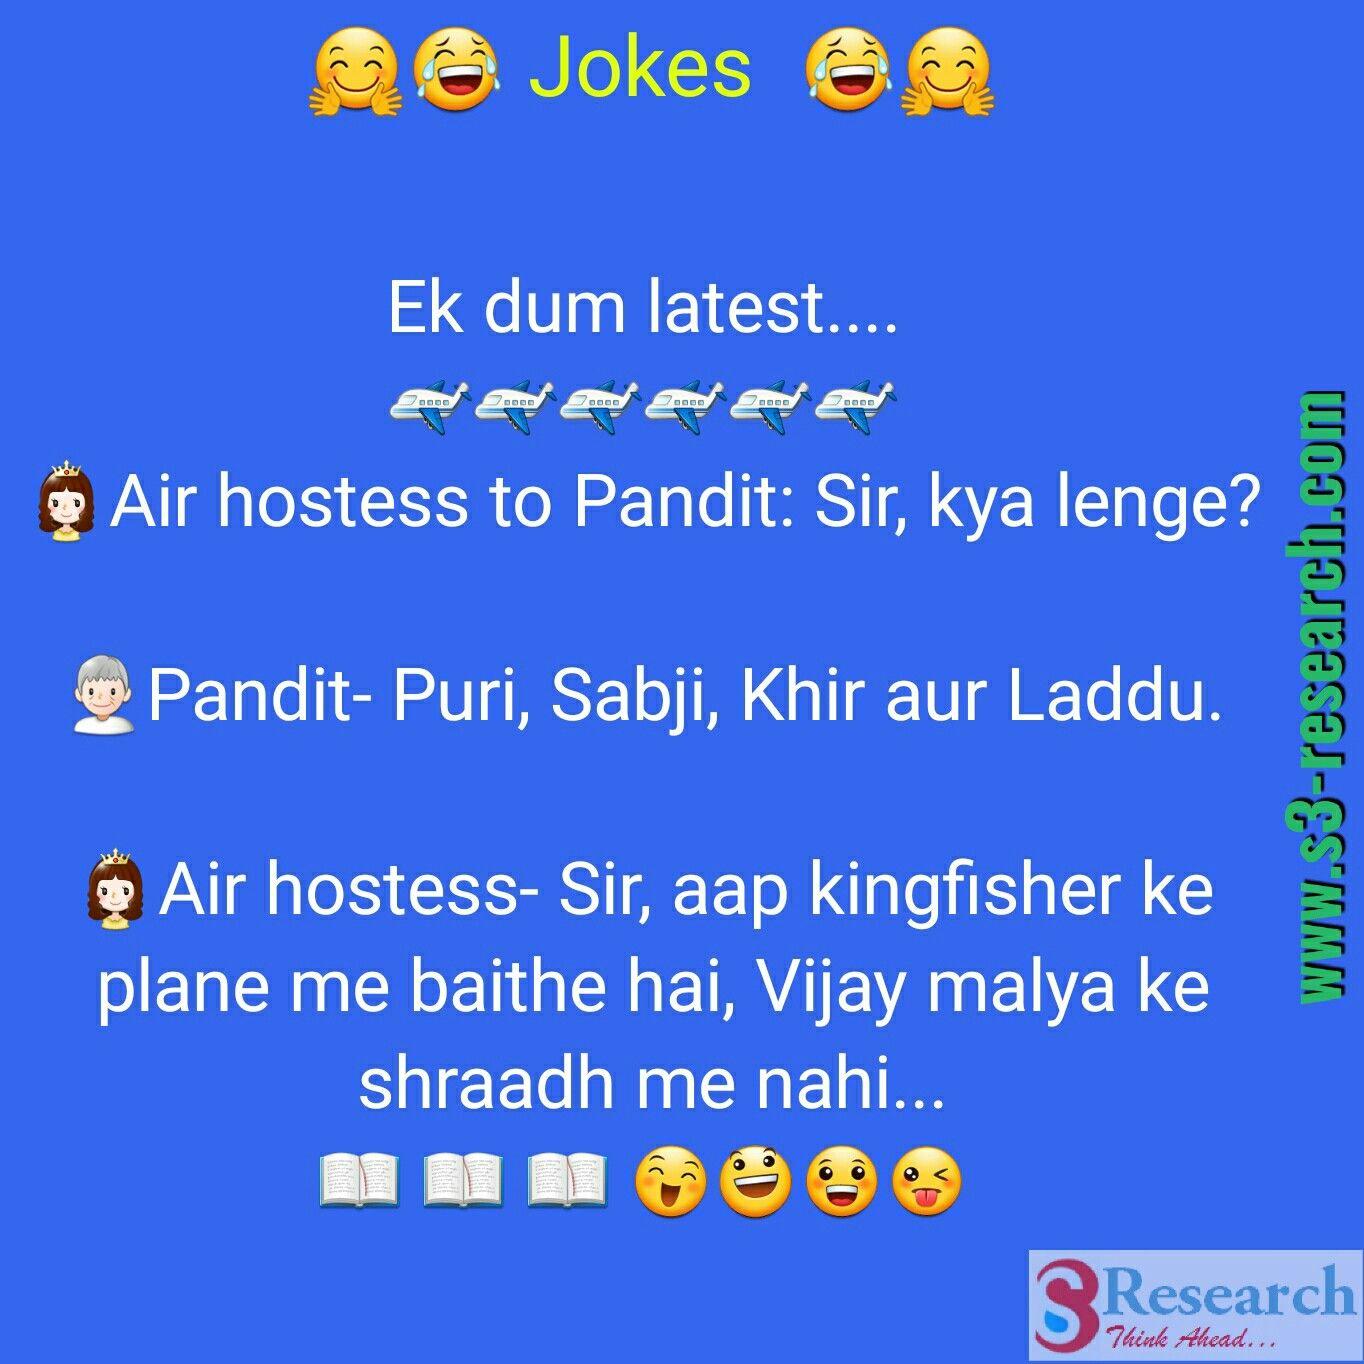 Idea by Sadhna Goel on Riddles & jokes Relatable post